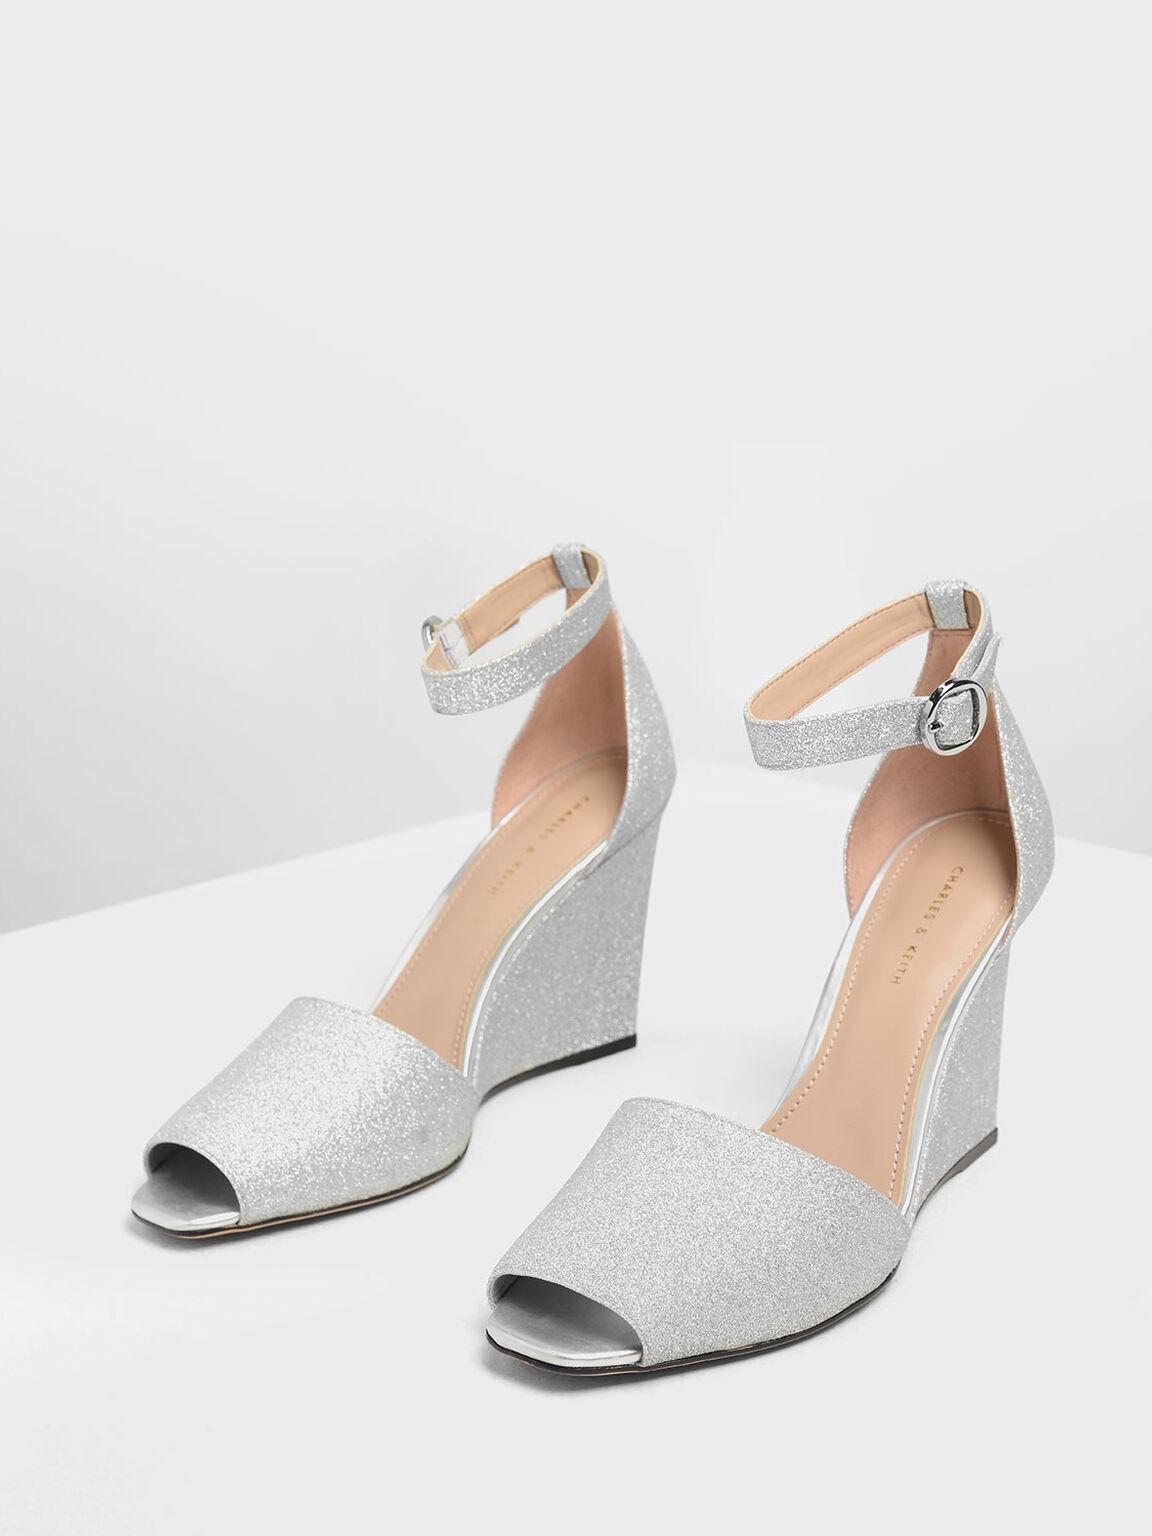 Glitter Peep Toe Wedges, Silver, hi-res